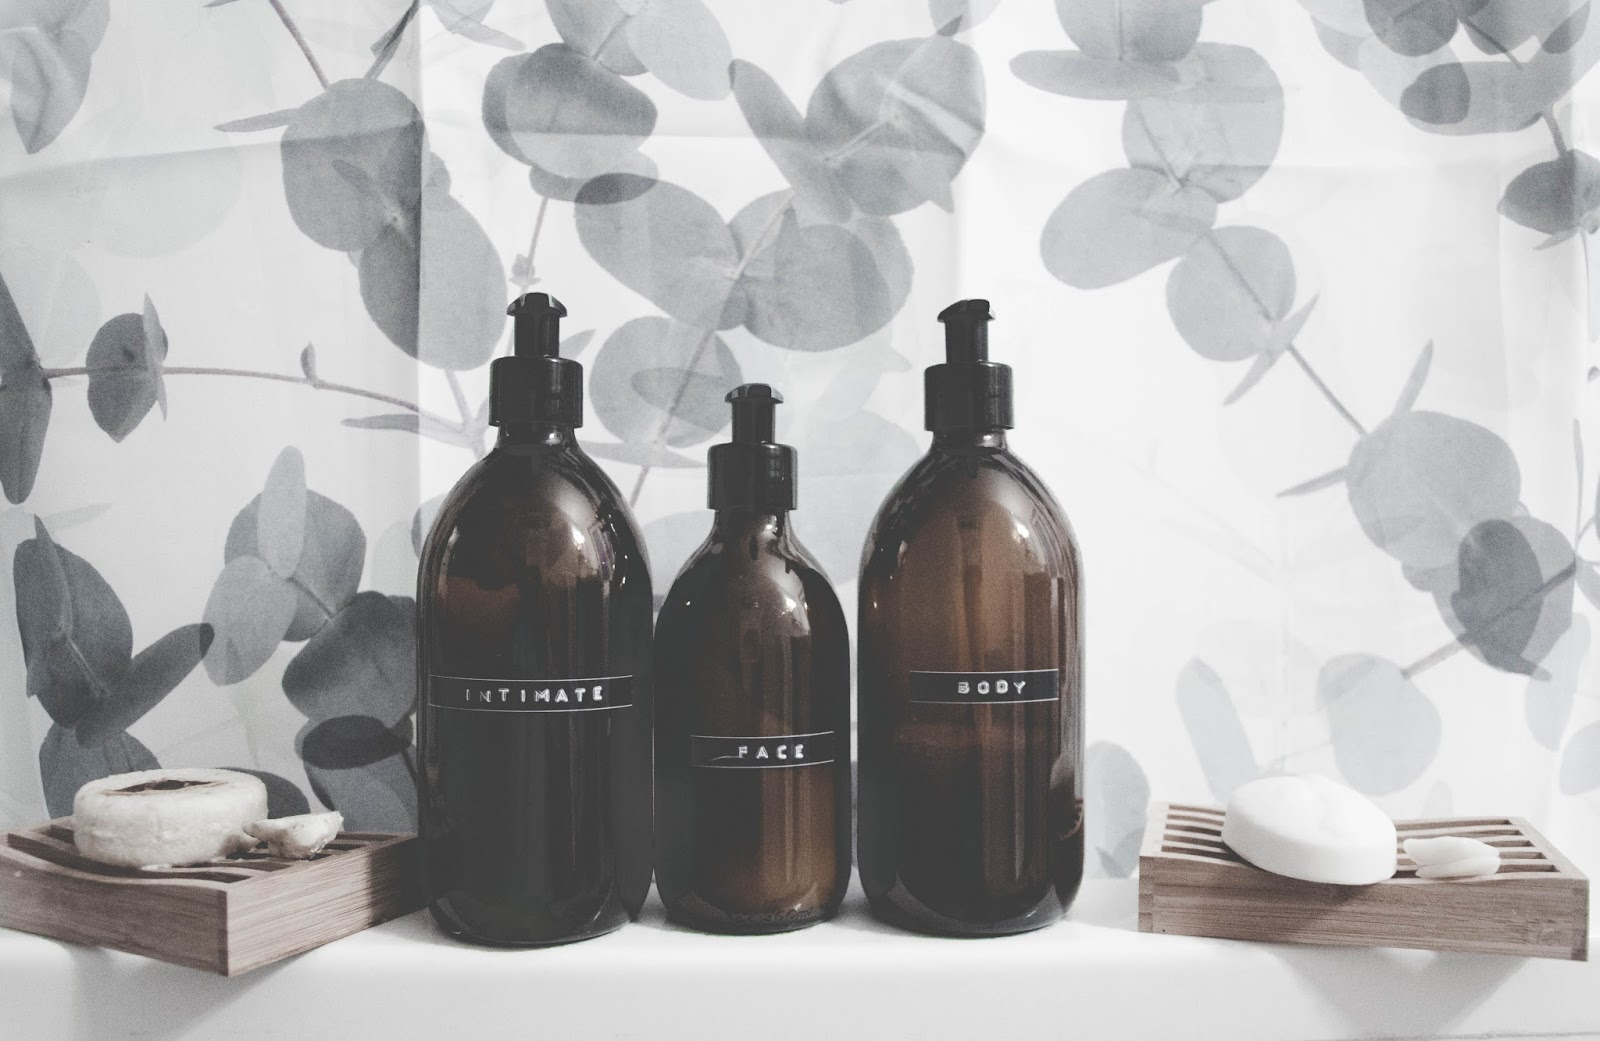 5 tips to make any bathroom look beautiful and serene